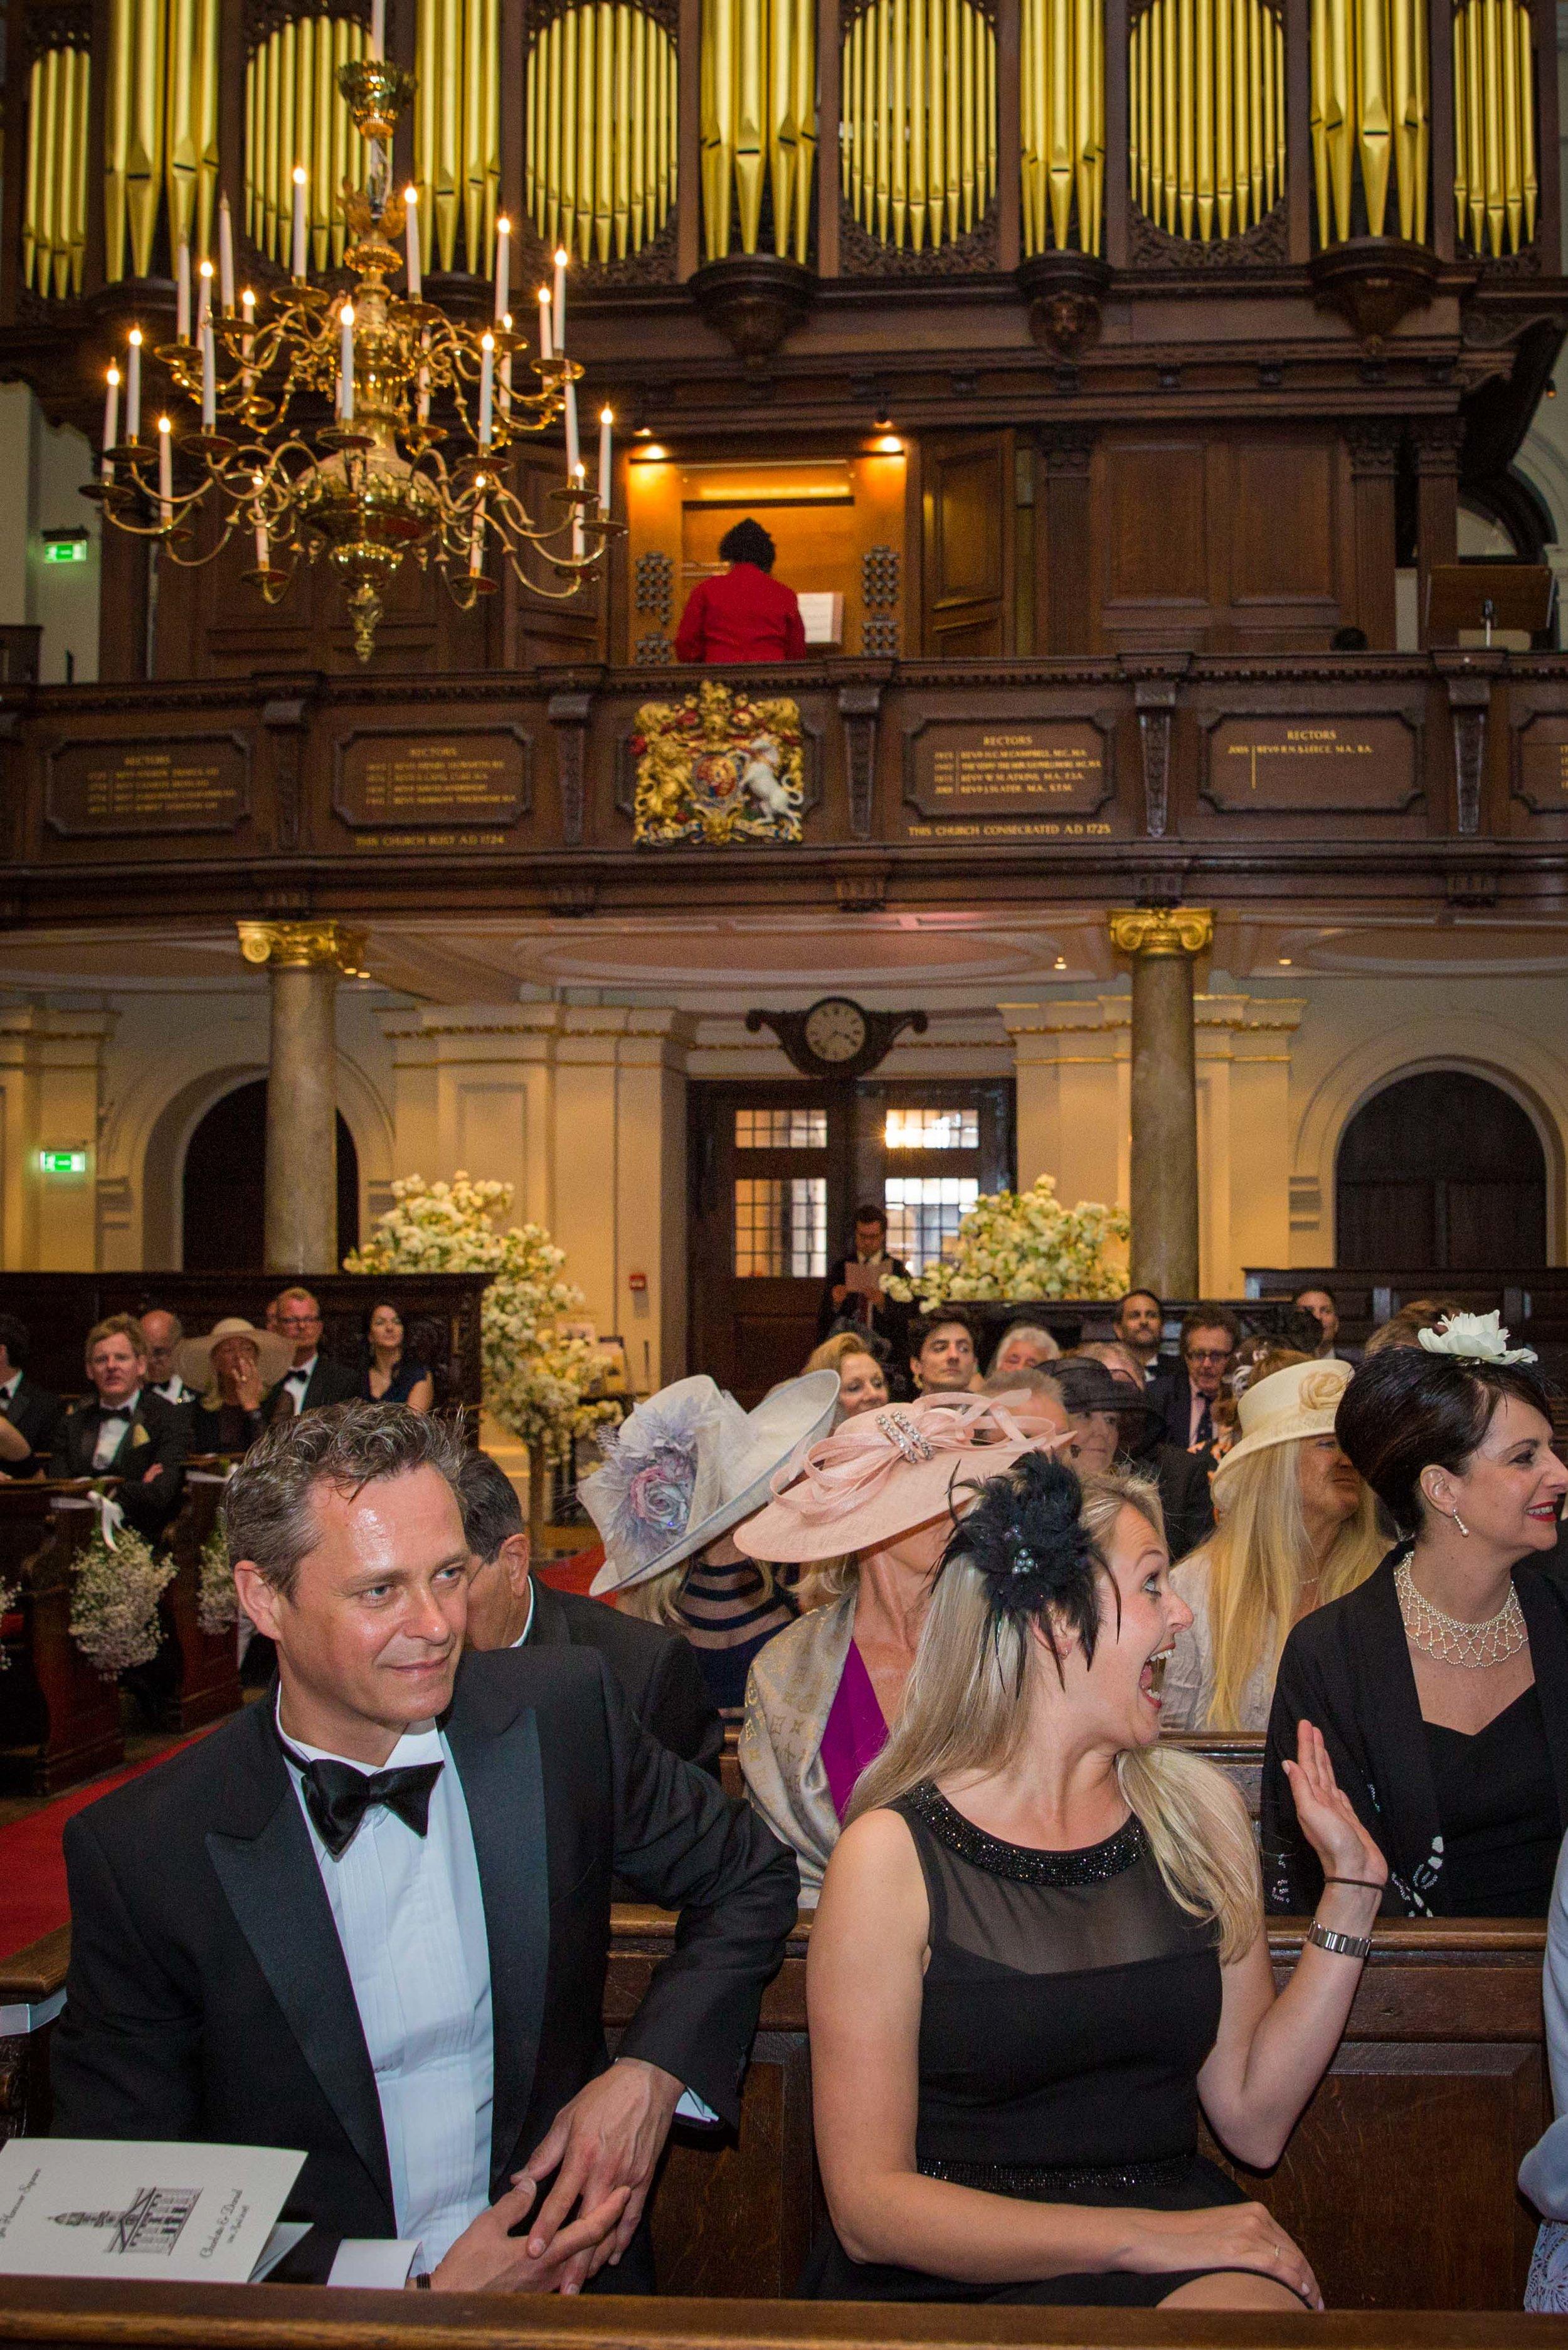 claridges-hotel-wedding-photographer-london-mayfair-natalia-smith-photography-75.jpg